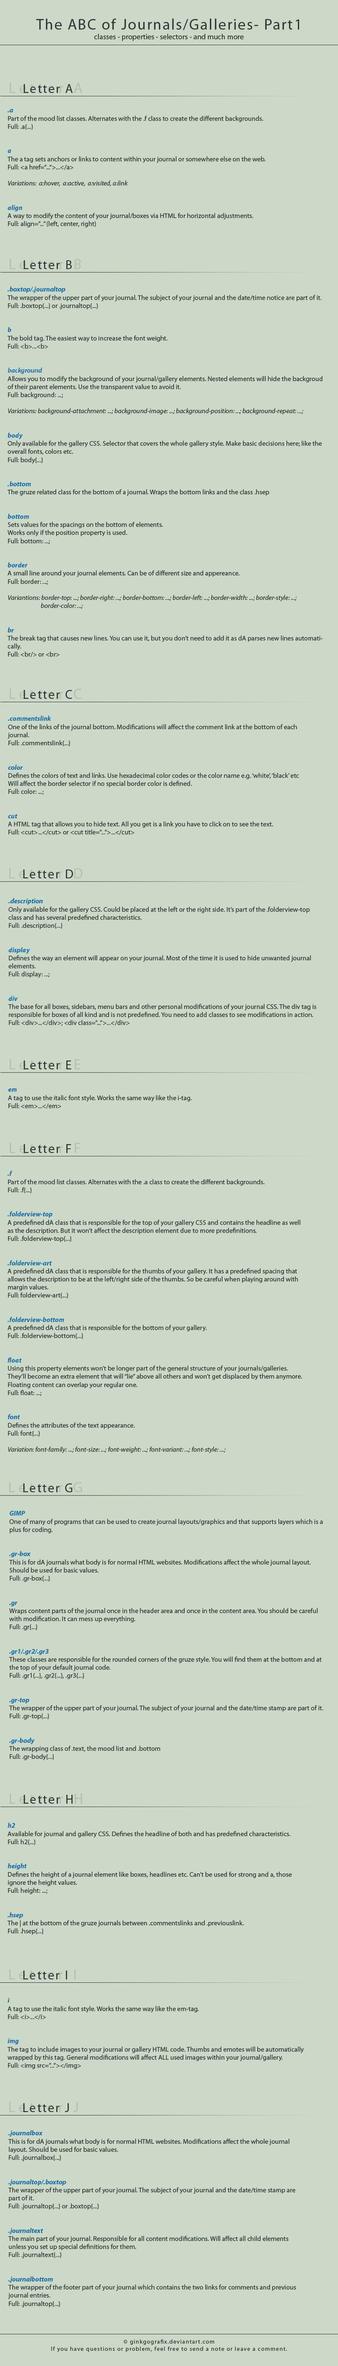 ABC of dA CSS - Part 1 by ginkgografix